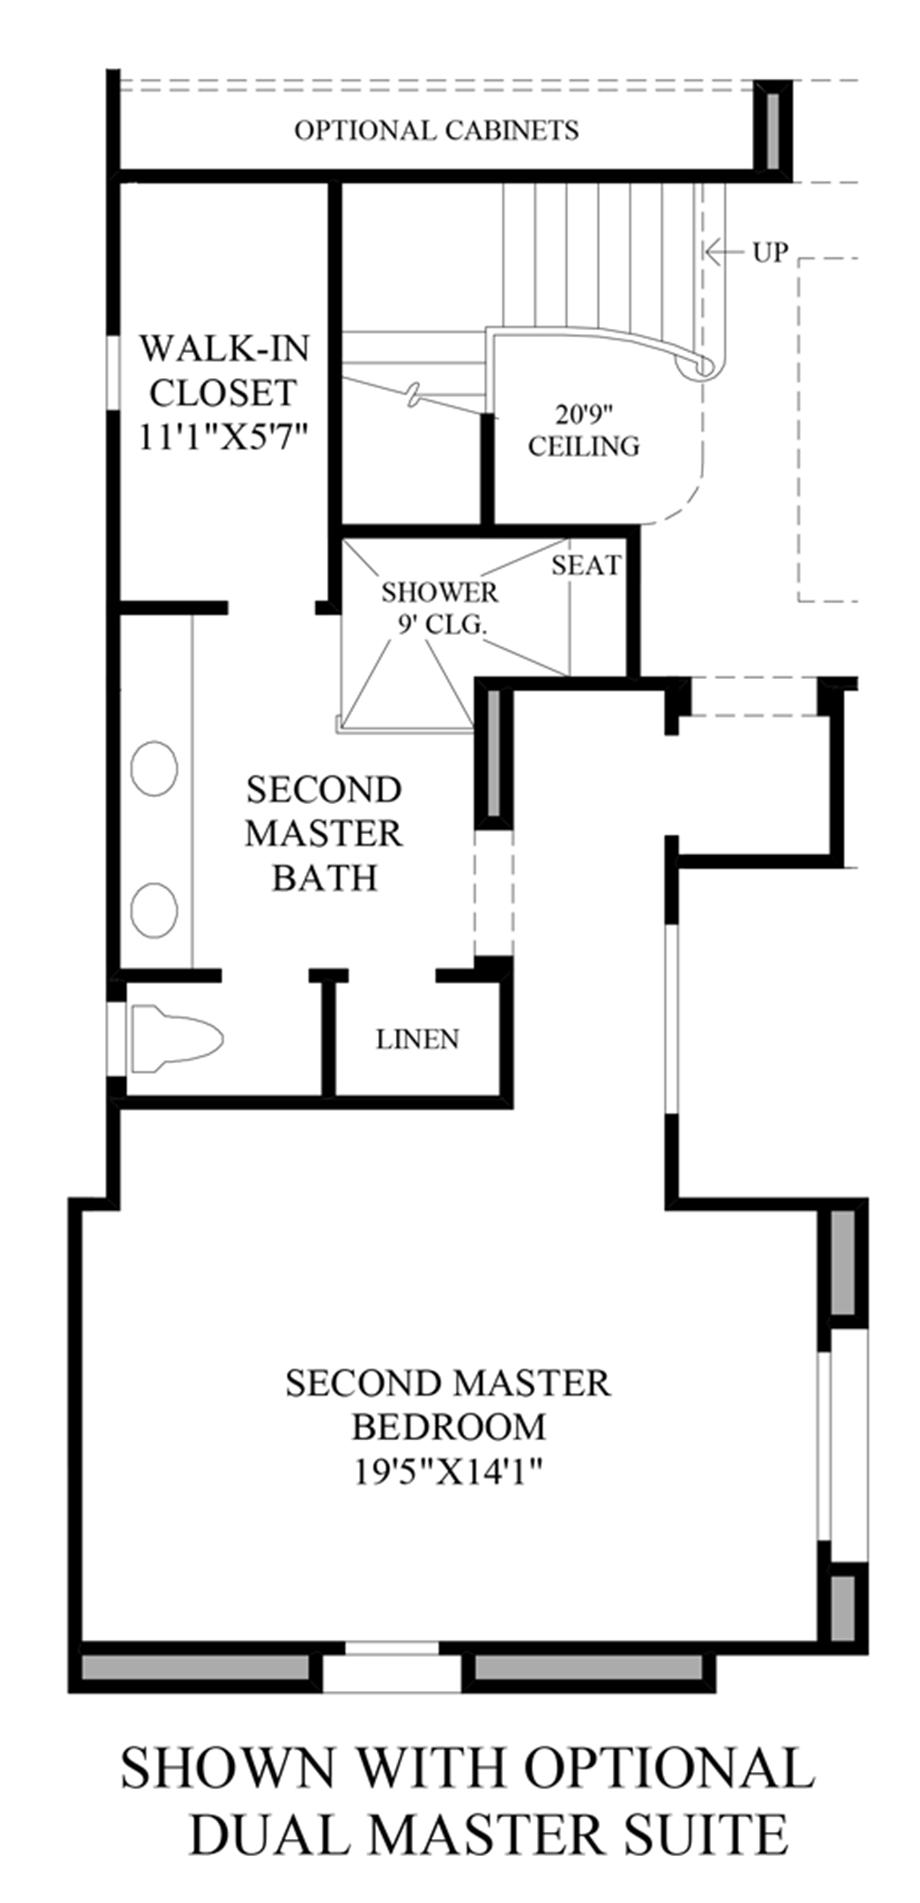 Optional Dual Master Suite Floor Plan